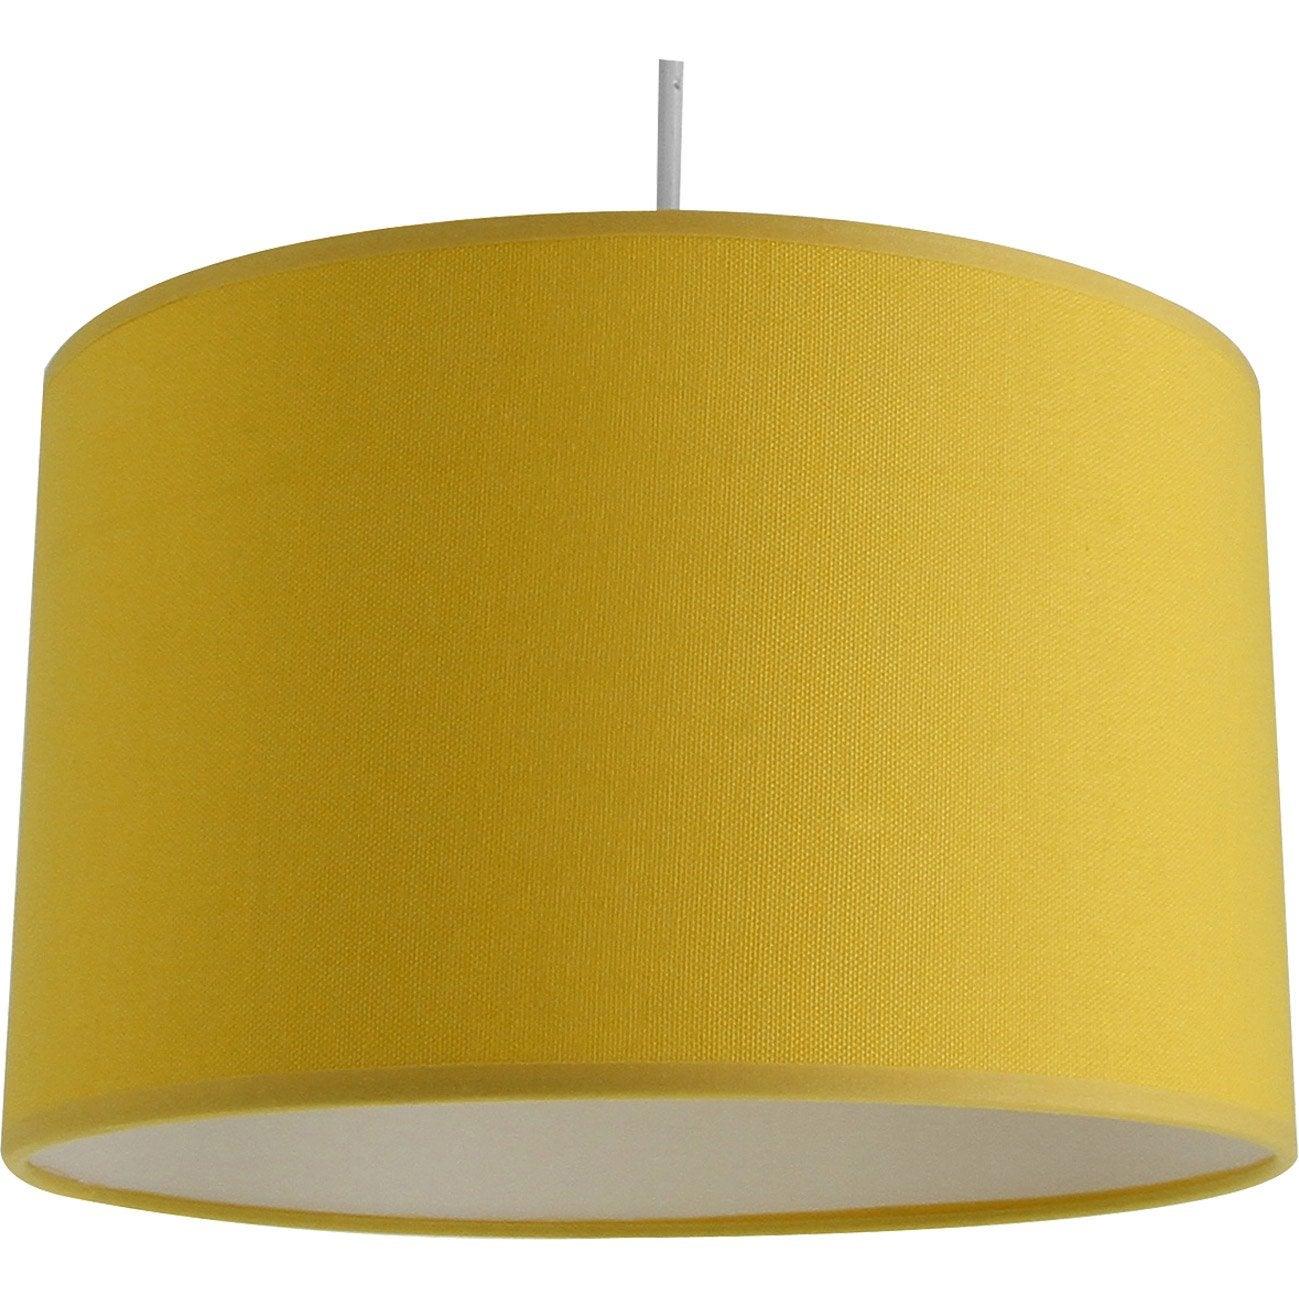 suspension e27 moderne natt coton jaune serin n 4 1 x 60w w metropolight leroy merlin. Black Bedroom Furniture Sets. Home Design Ideas